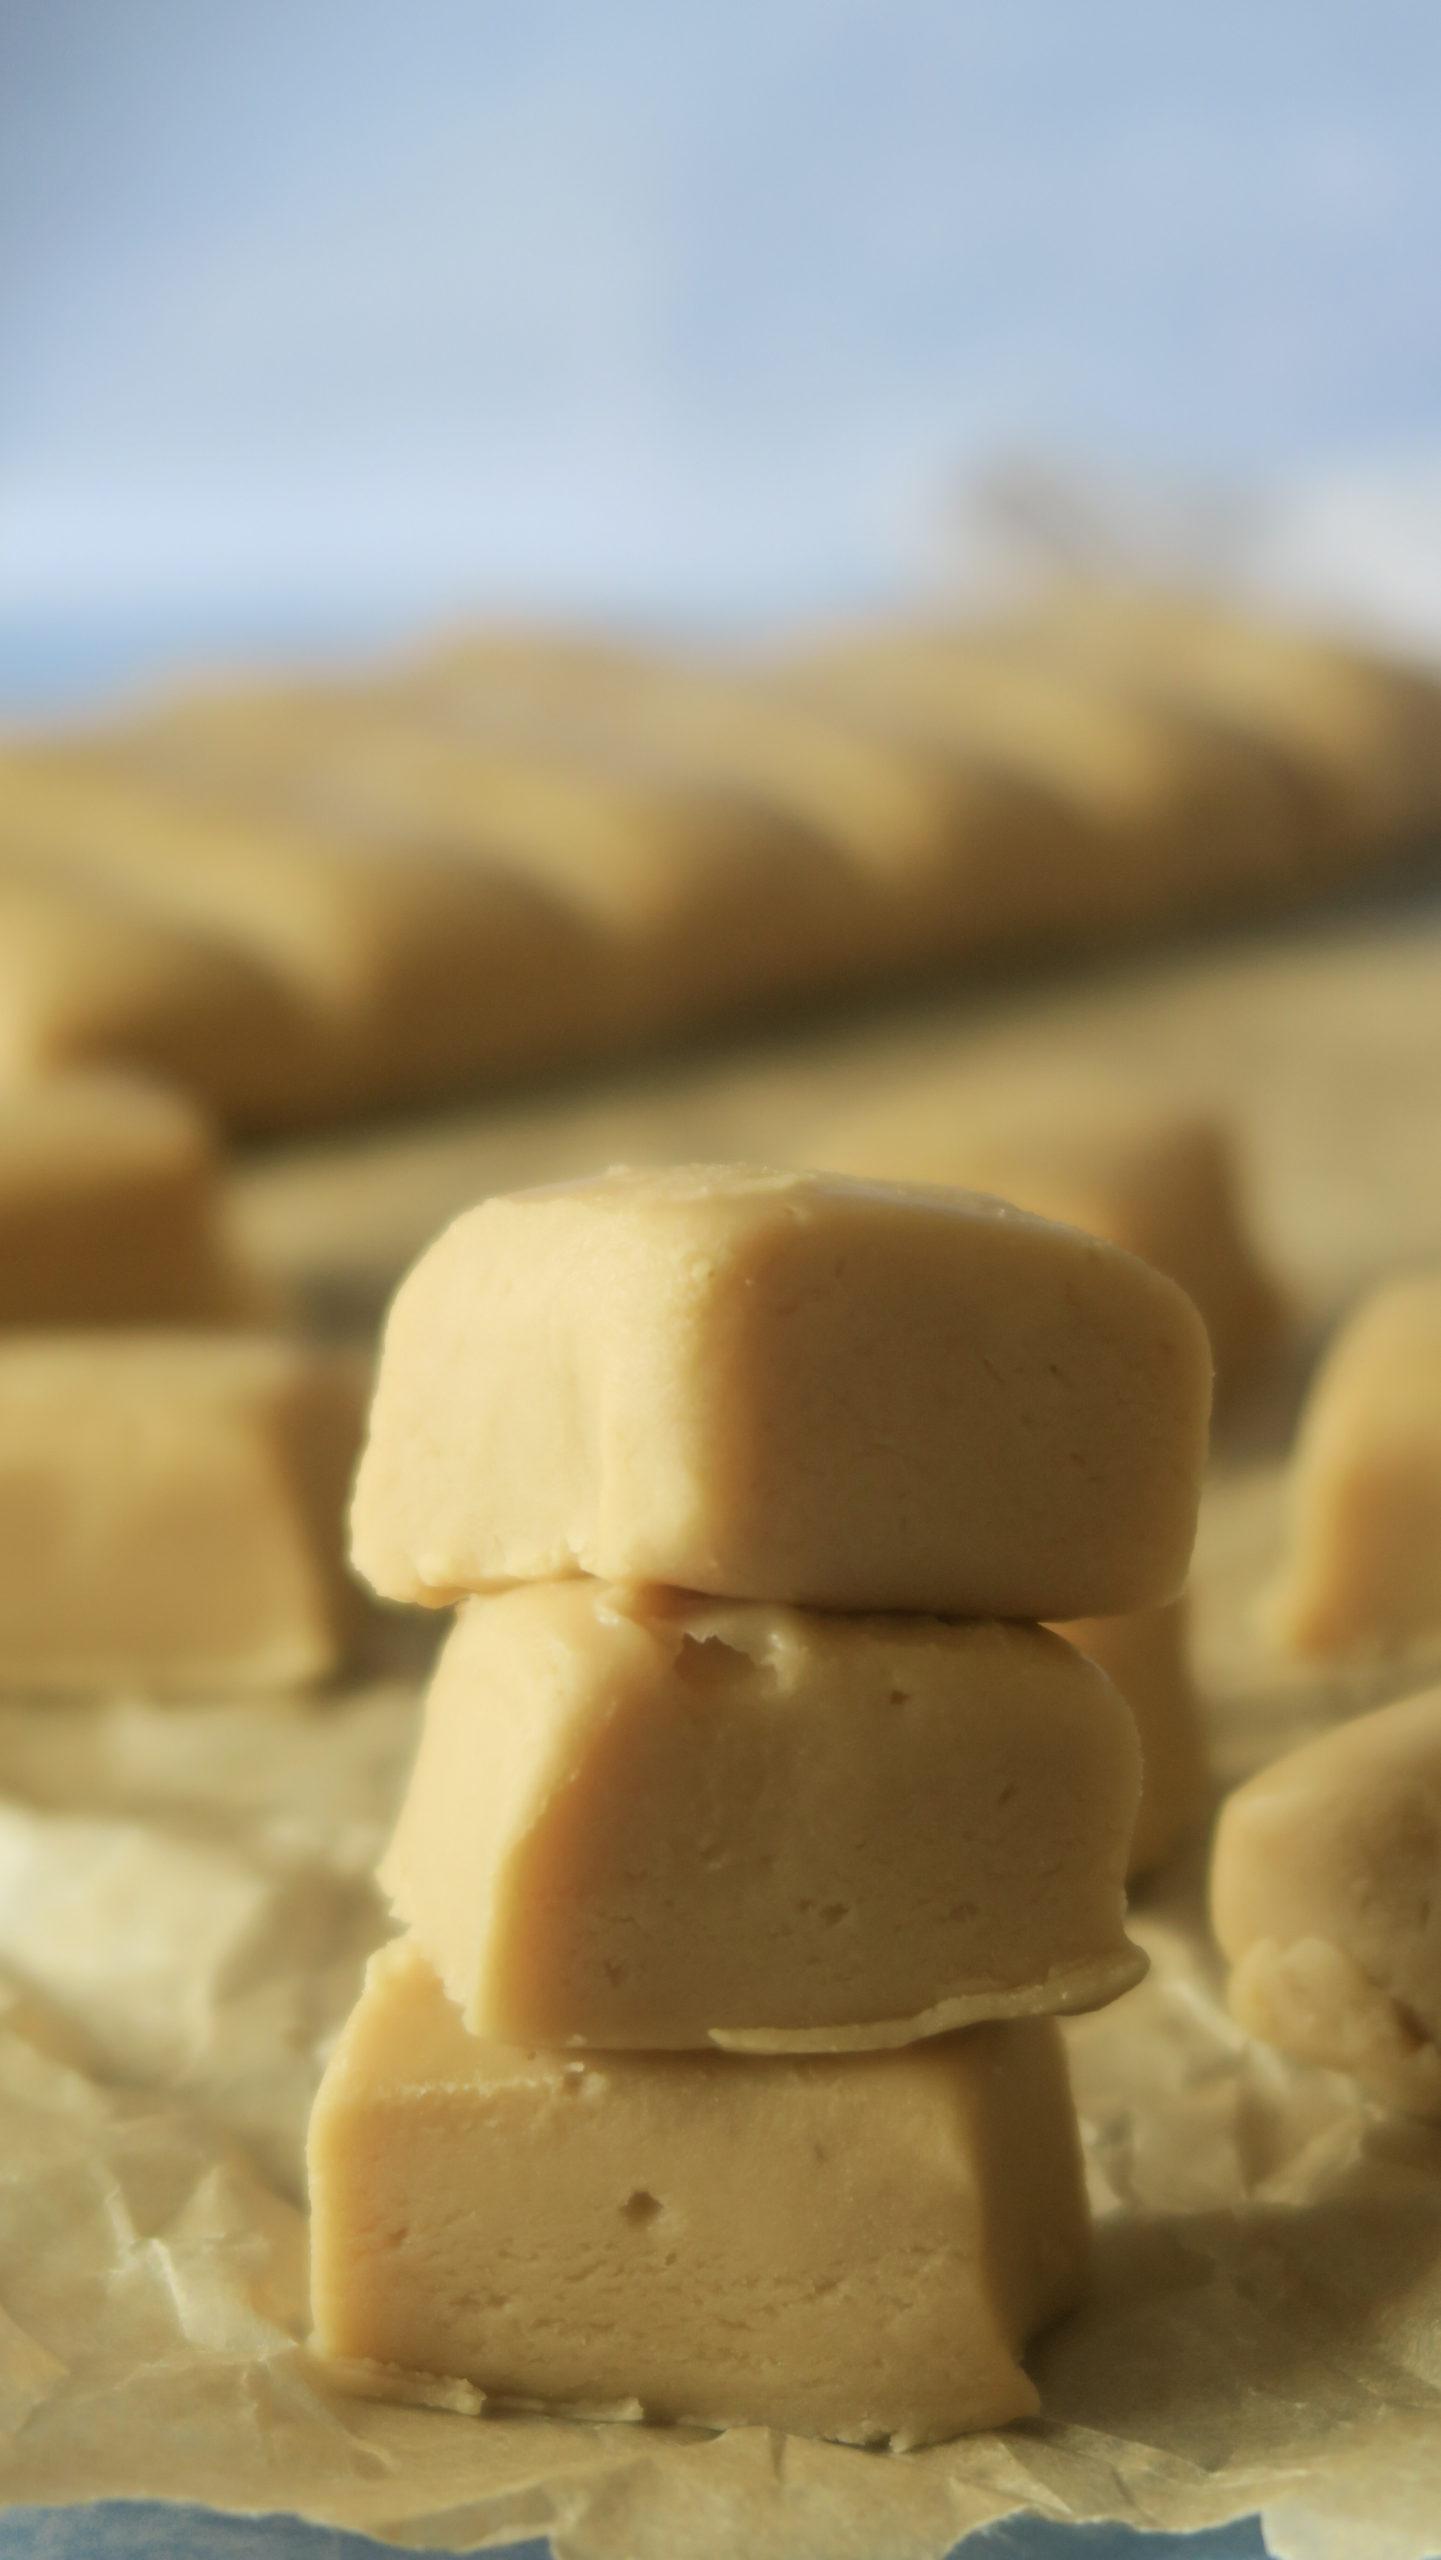 A stack of fudge